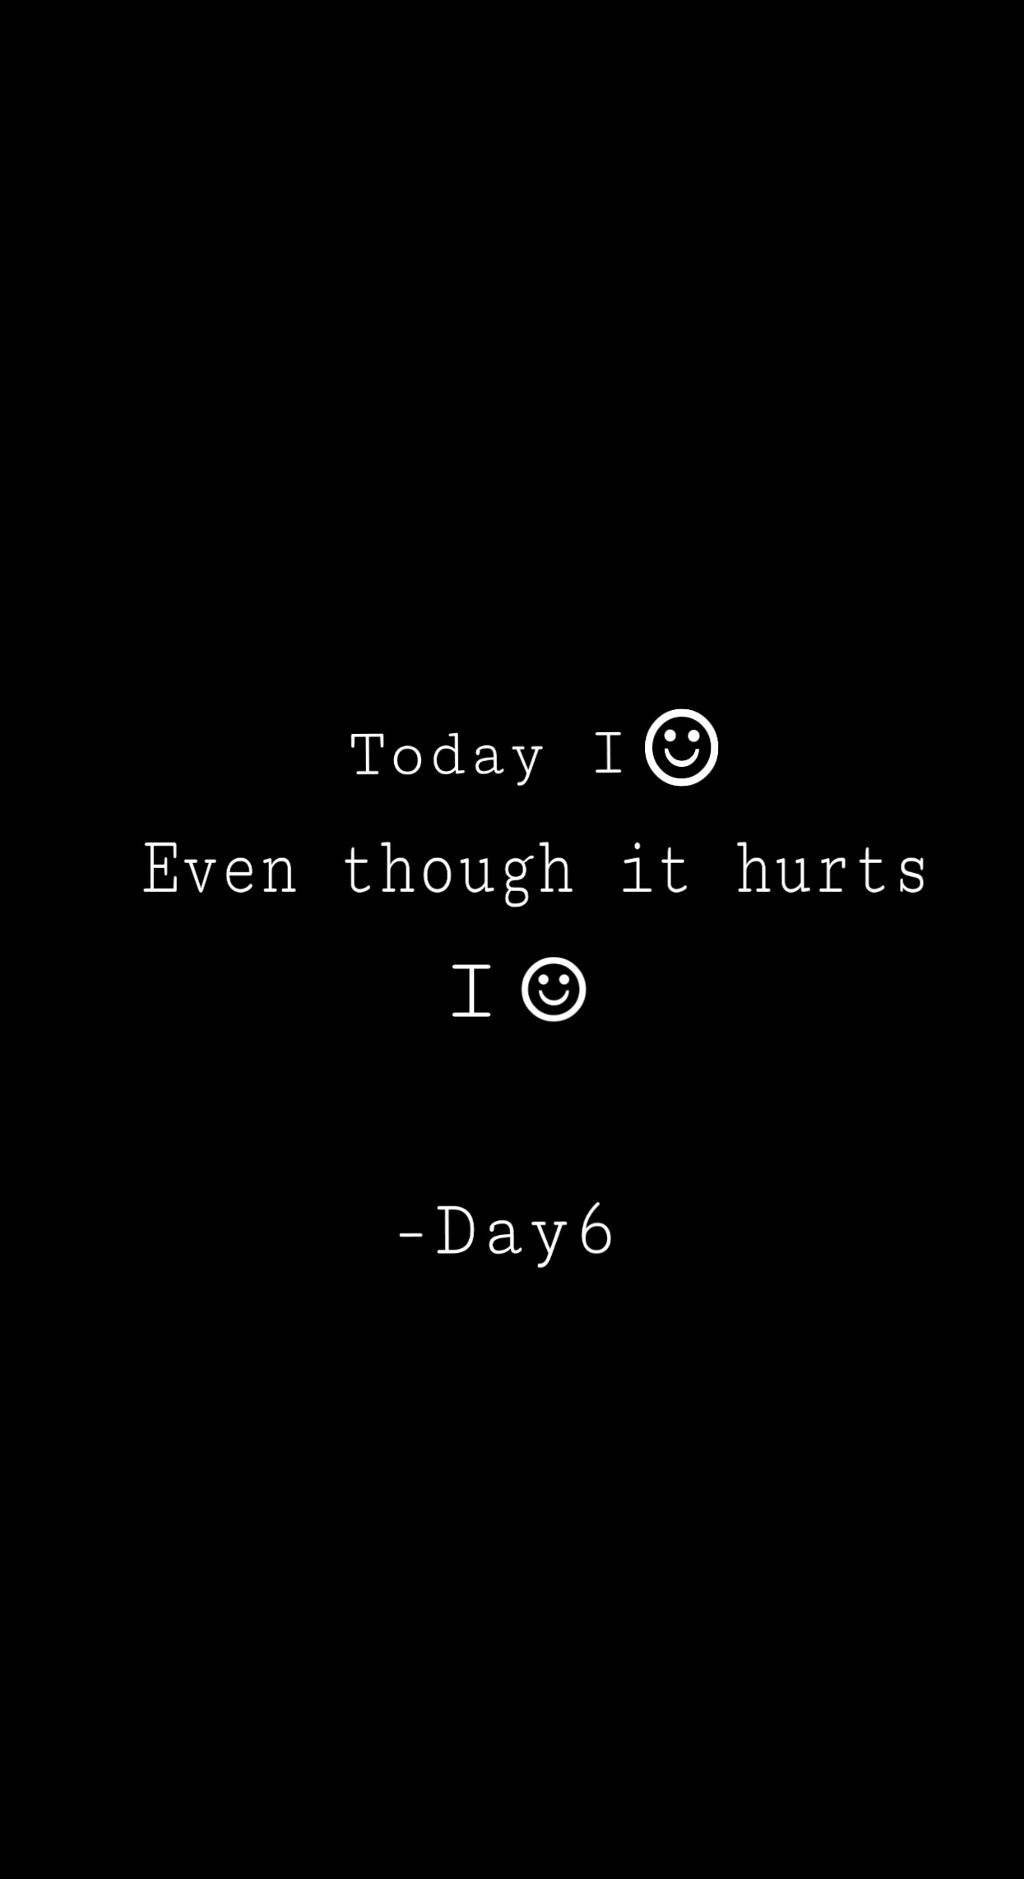 Day6 Kpop Phrases Sad Smile Wallpaper Hurt